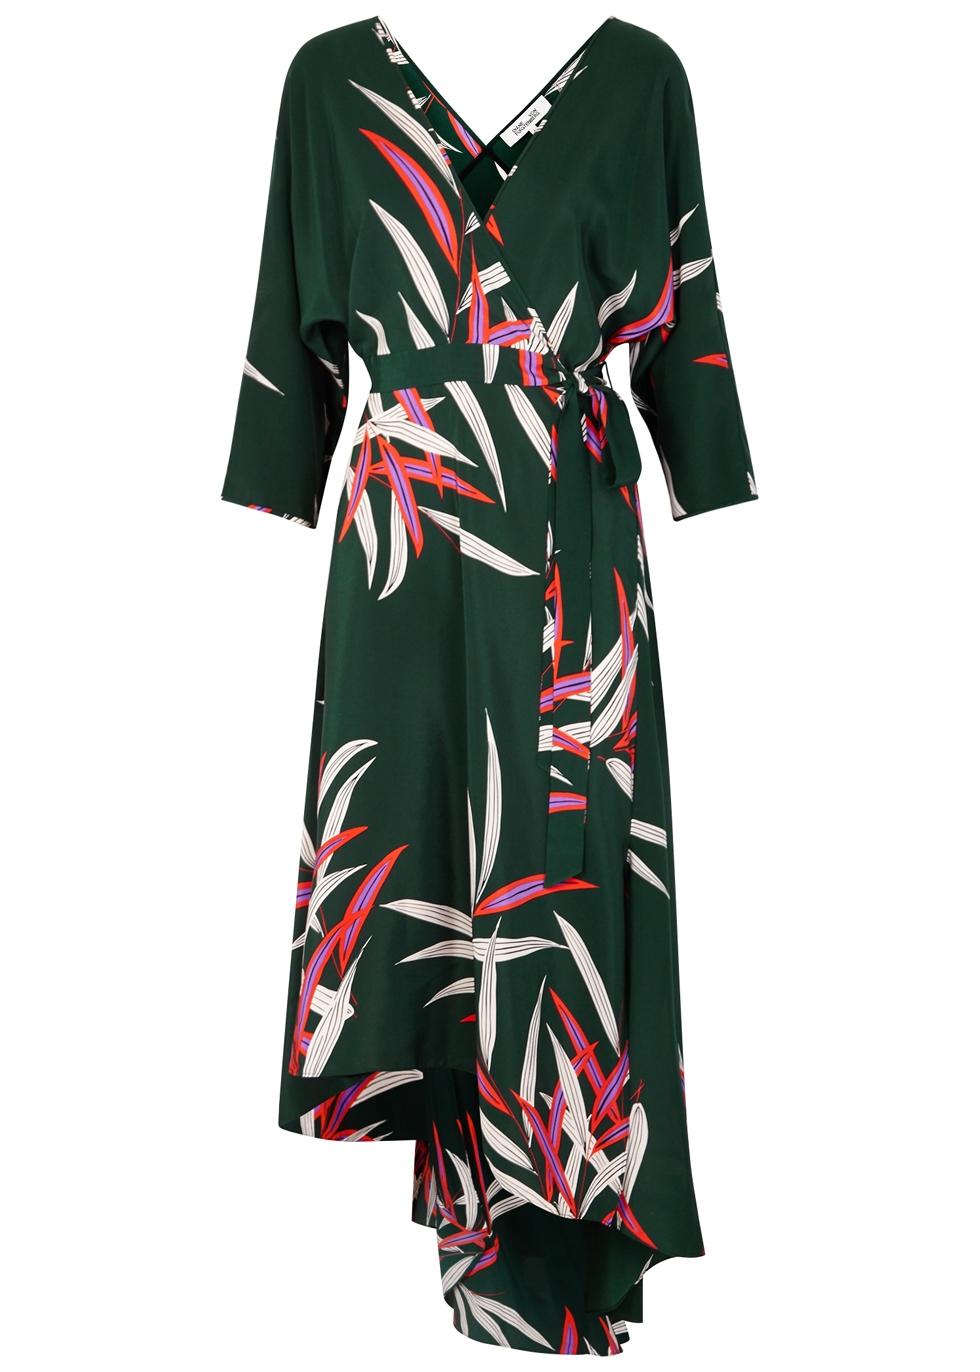 Eloise Wrap-Effect Printed Silk Crepe De Chine Midi Dress in Dark Green